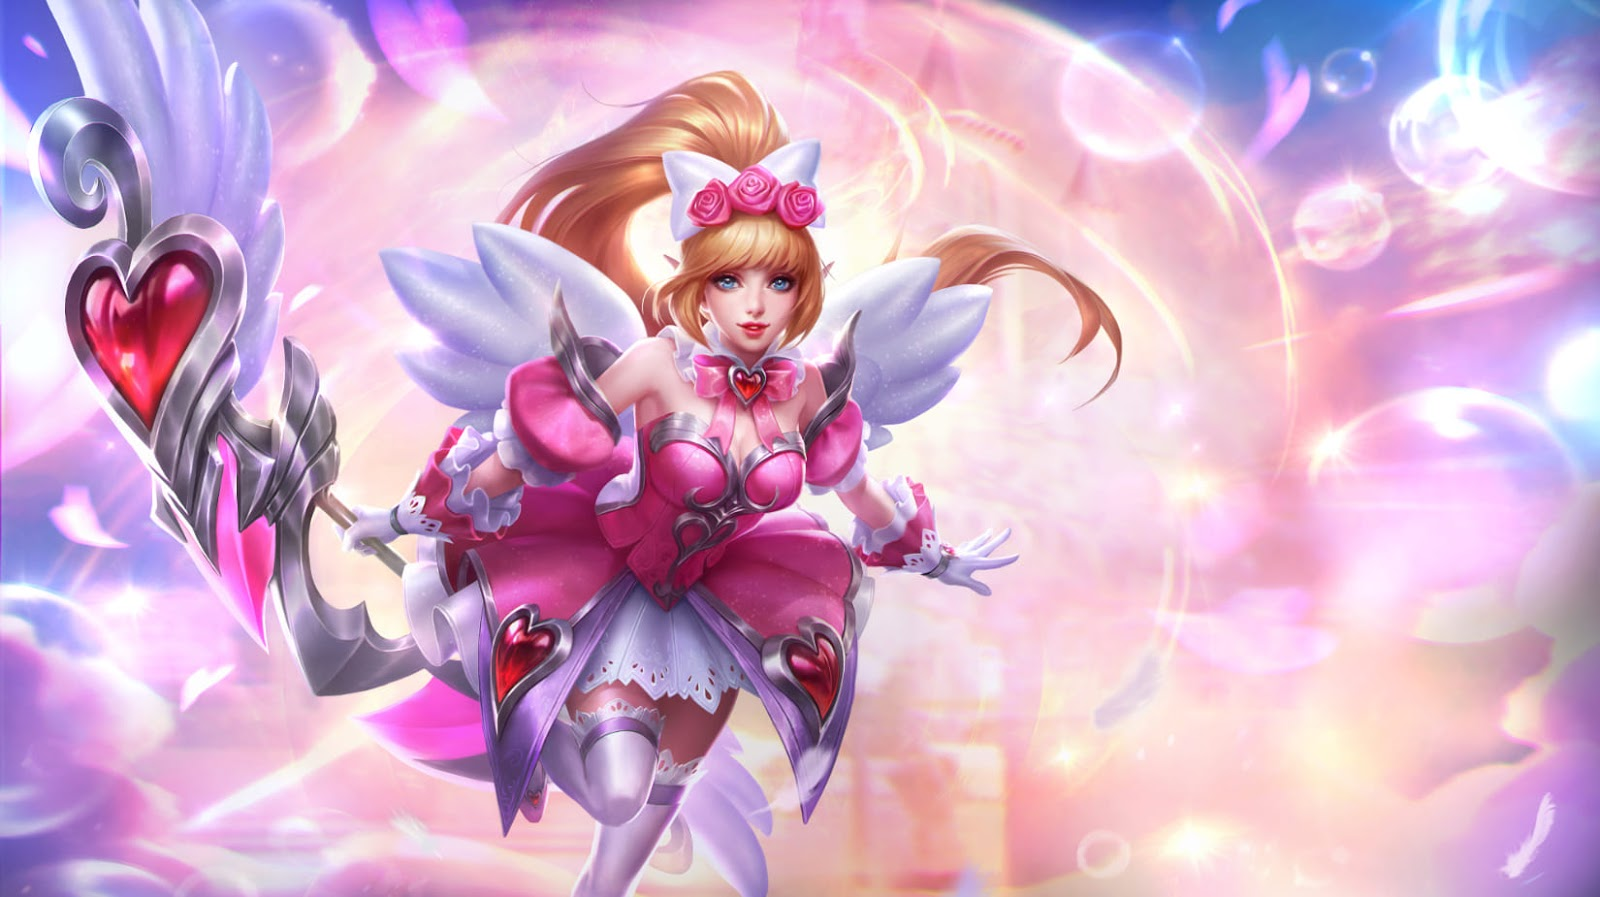 Wallpaper Miya Sweet Fantasy Skin Mobile Legends HD for PC